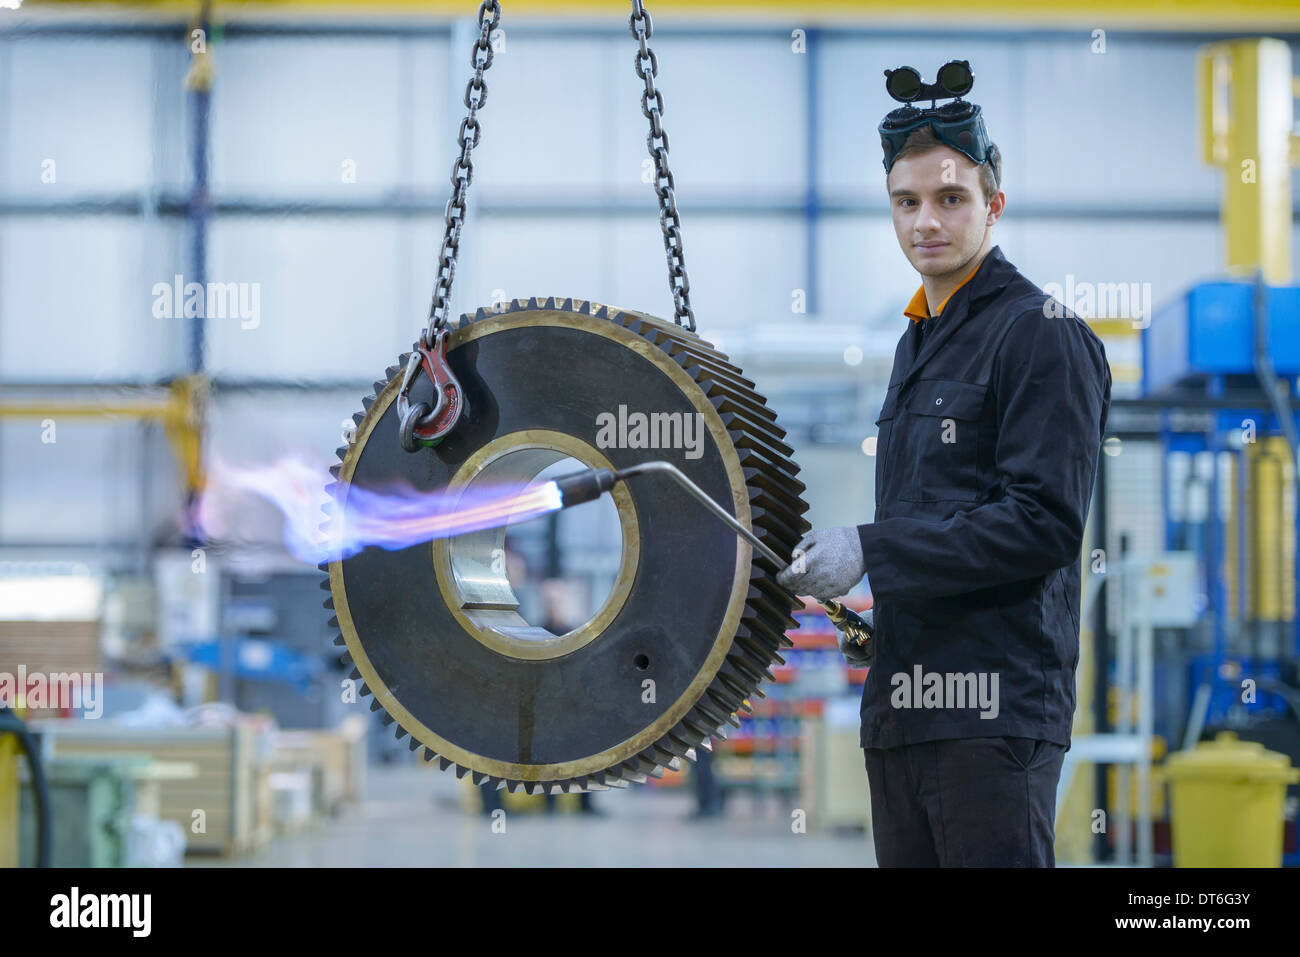 Portrait of engineer heat treating industrial gear in factory - Stock Image